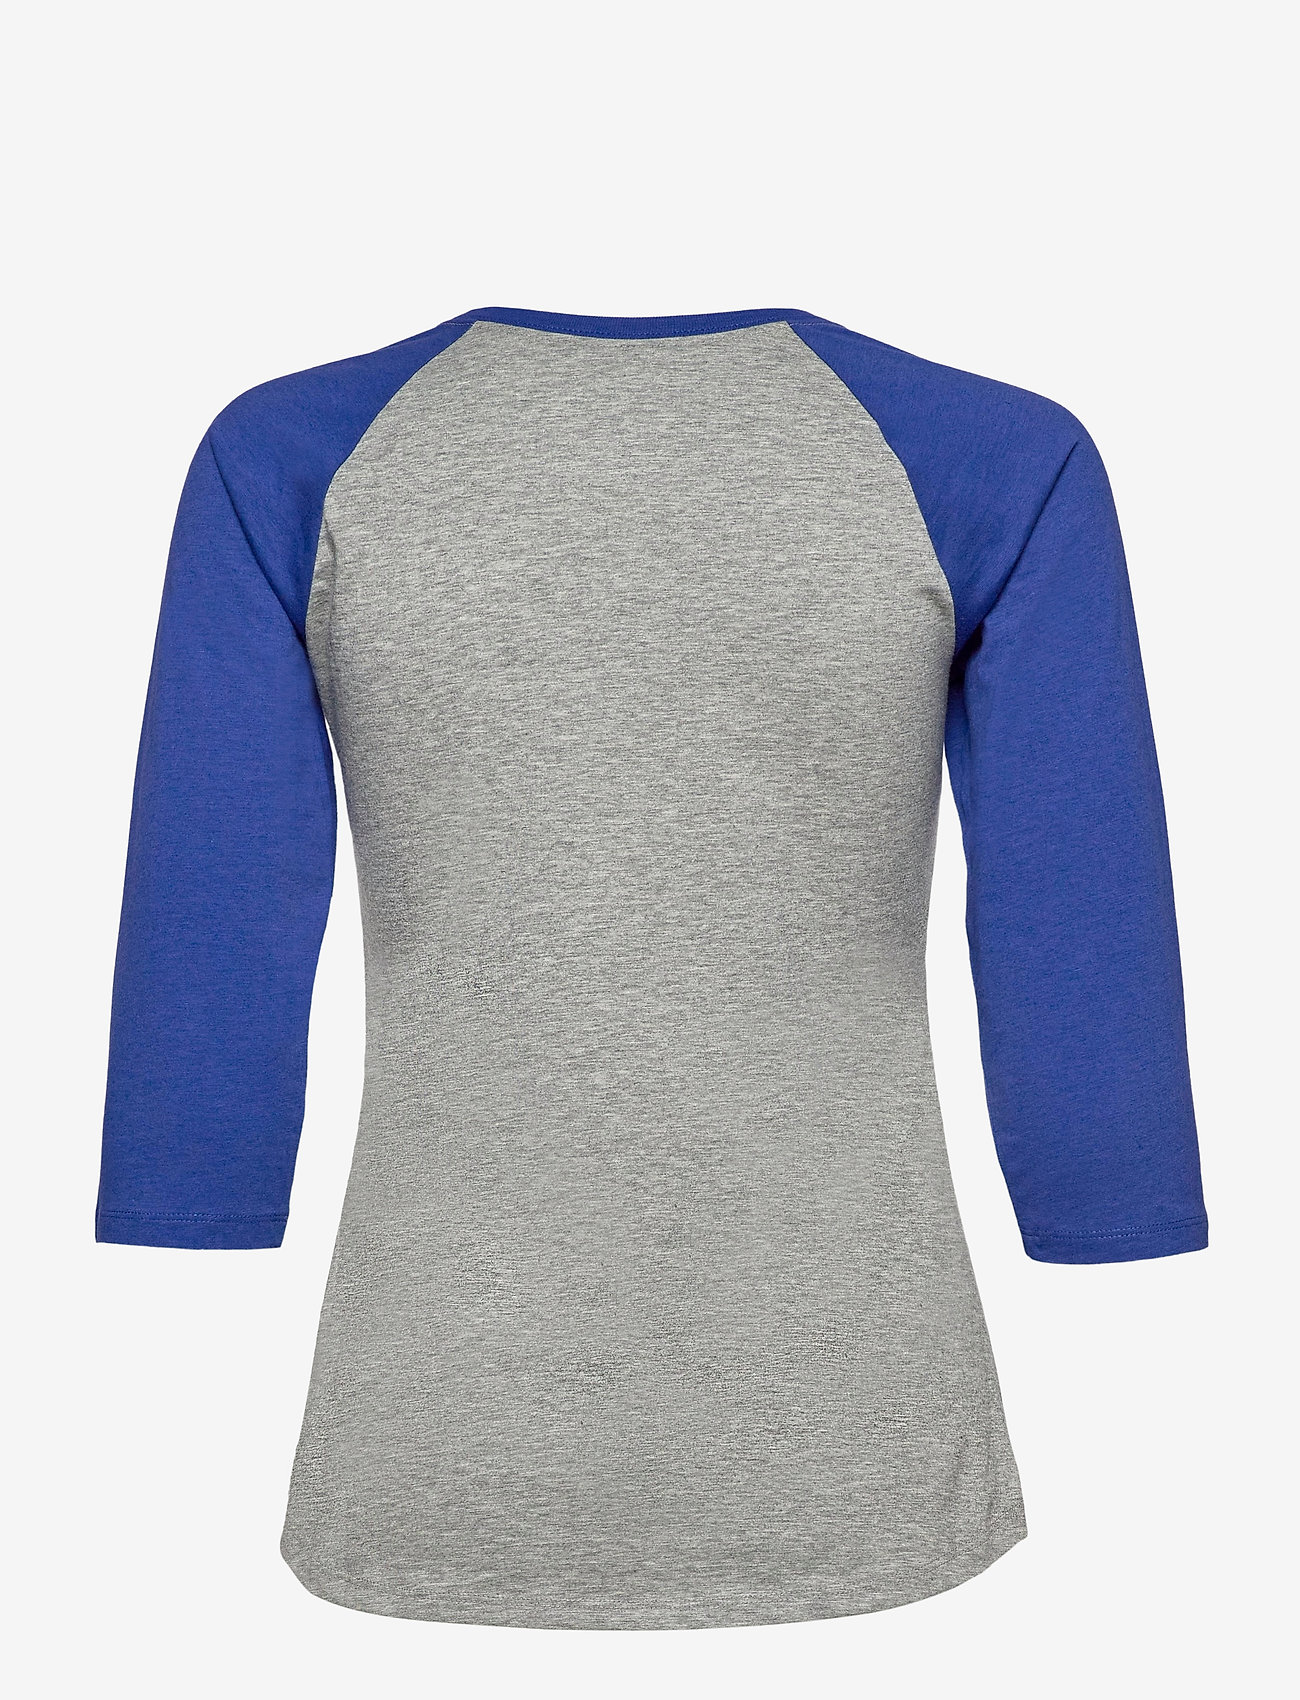 NIKE Fan Gear - LA Dodgers Nike Encircled Tri-Blend 3/4-Sleeve - longsleeved tops - dark grey heather - rush blue - 1